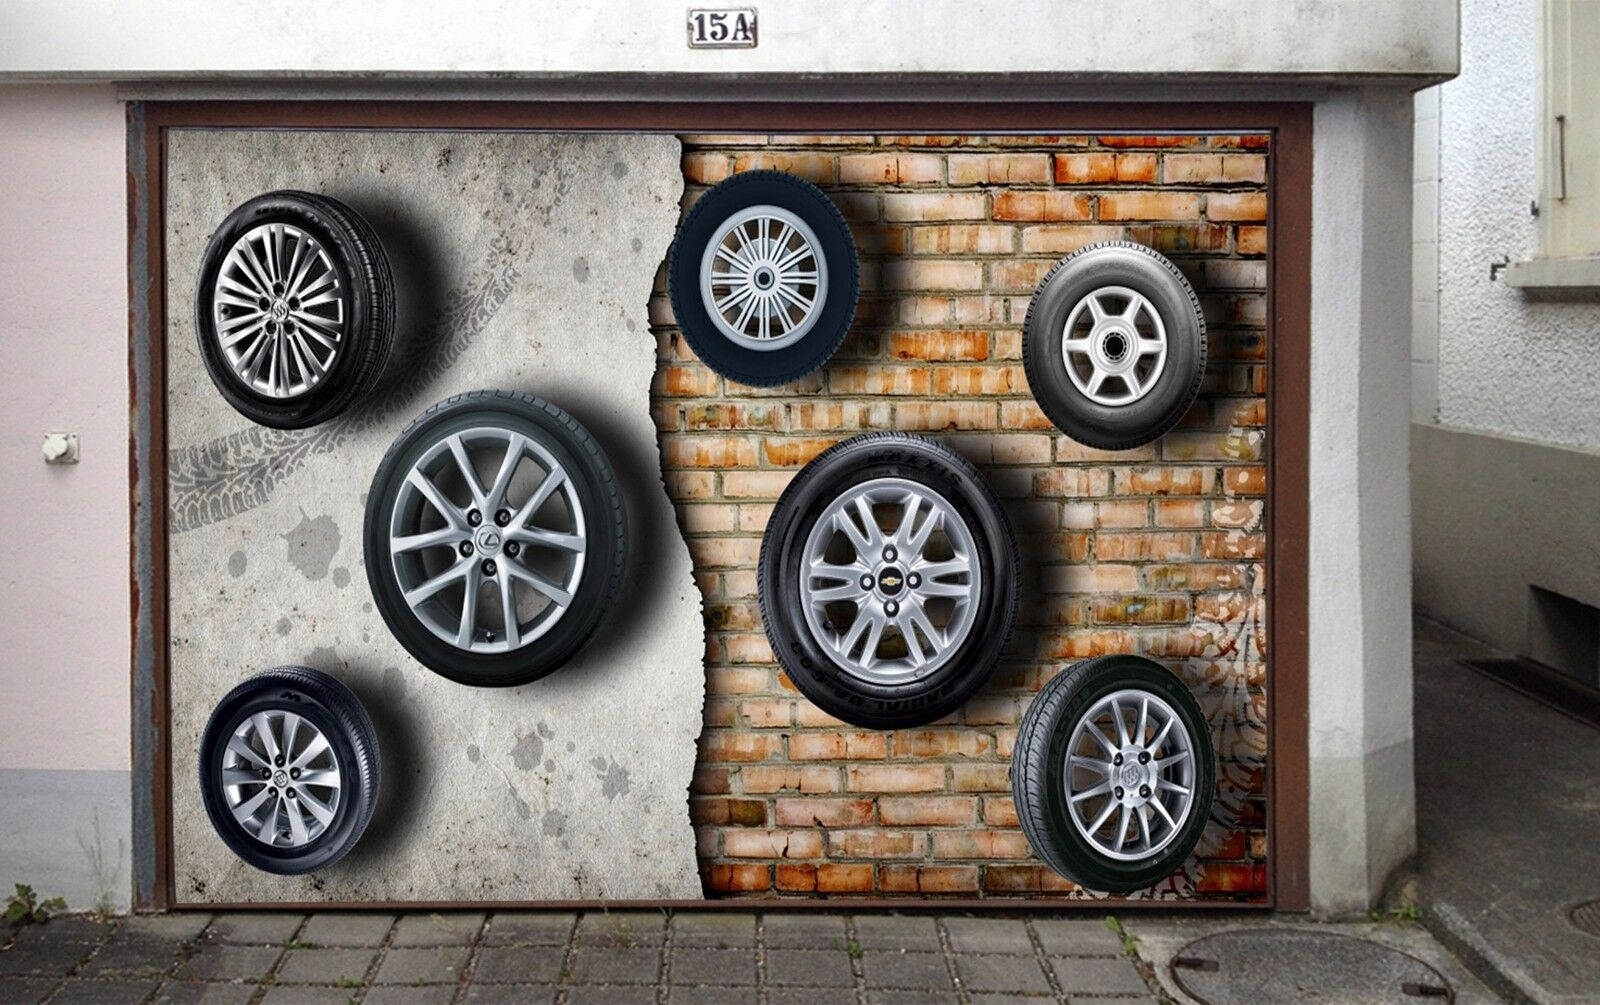 3D Tire Walls 783 Garage Door Murals Wall Print Decal Wall AJ WALLPAPER UK Carly